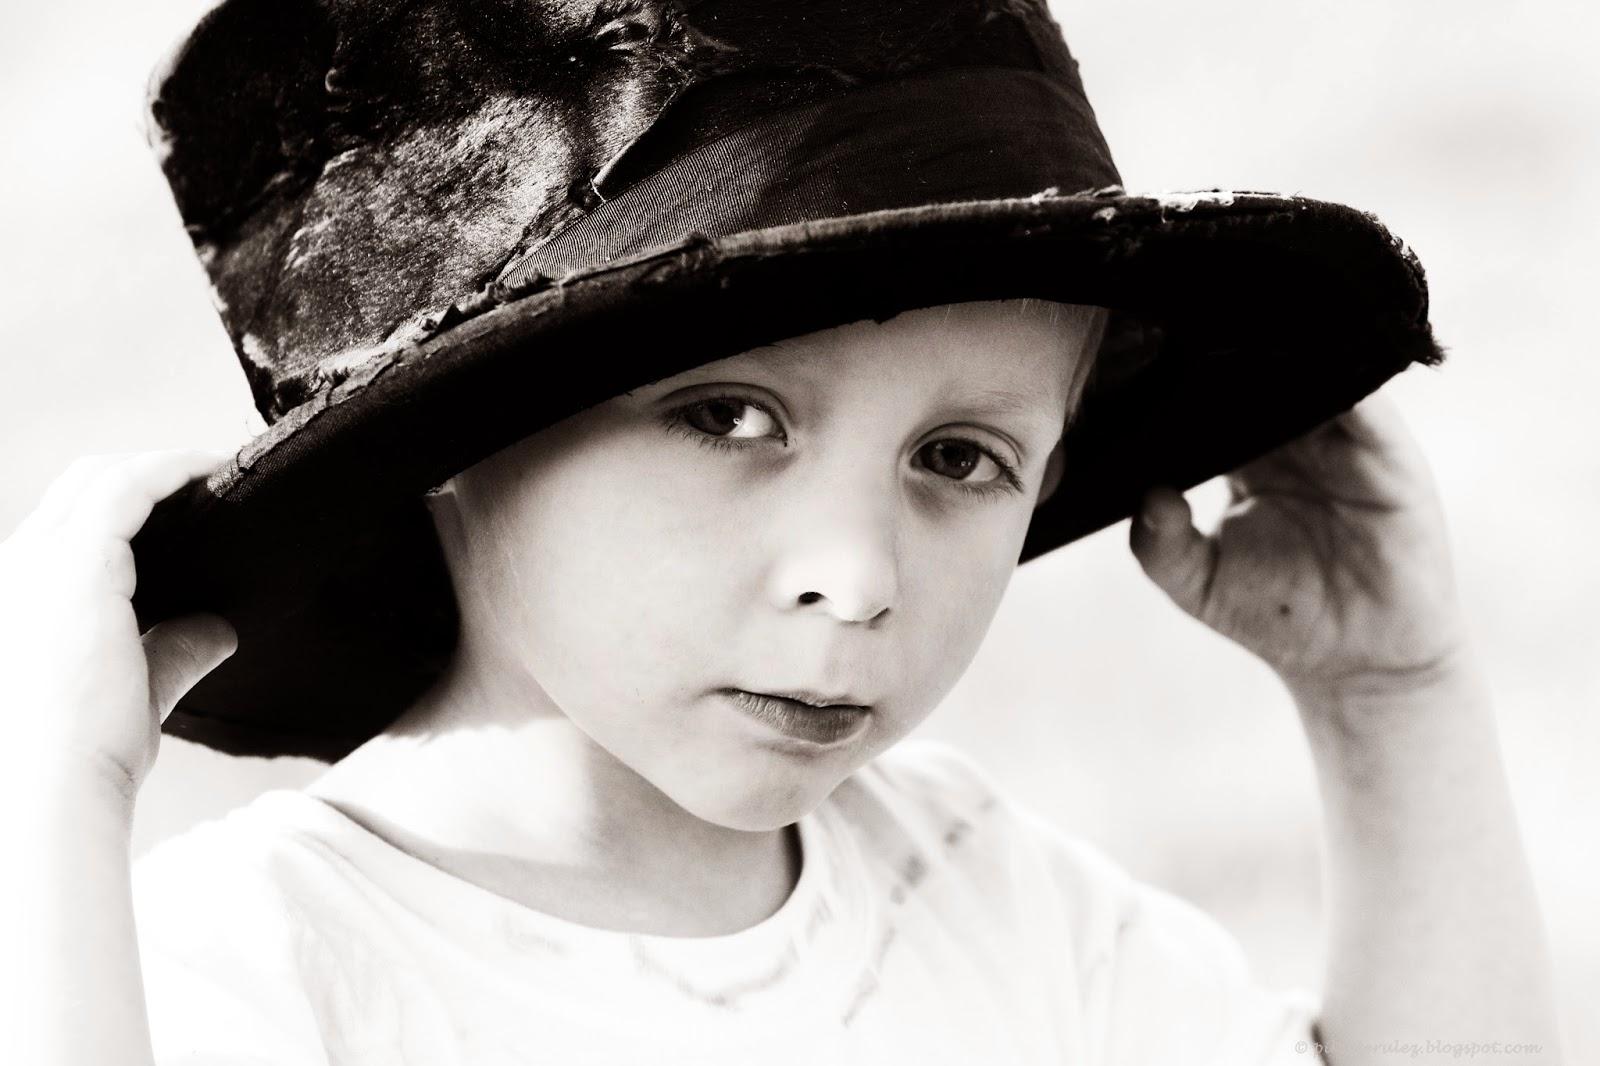 blackandwhite, kapelusz, chłopiec, Agata Raszke